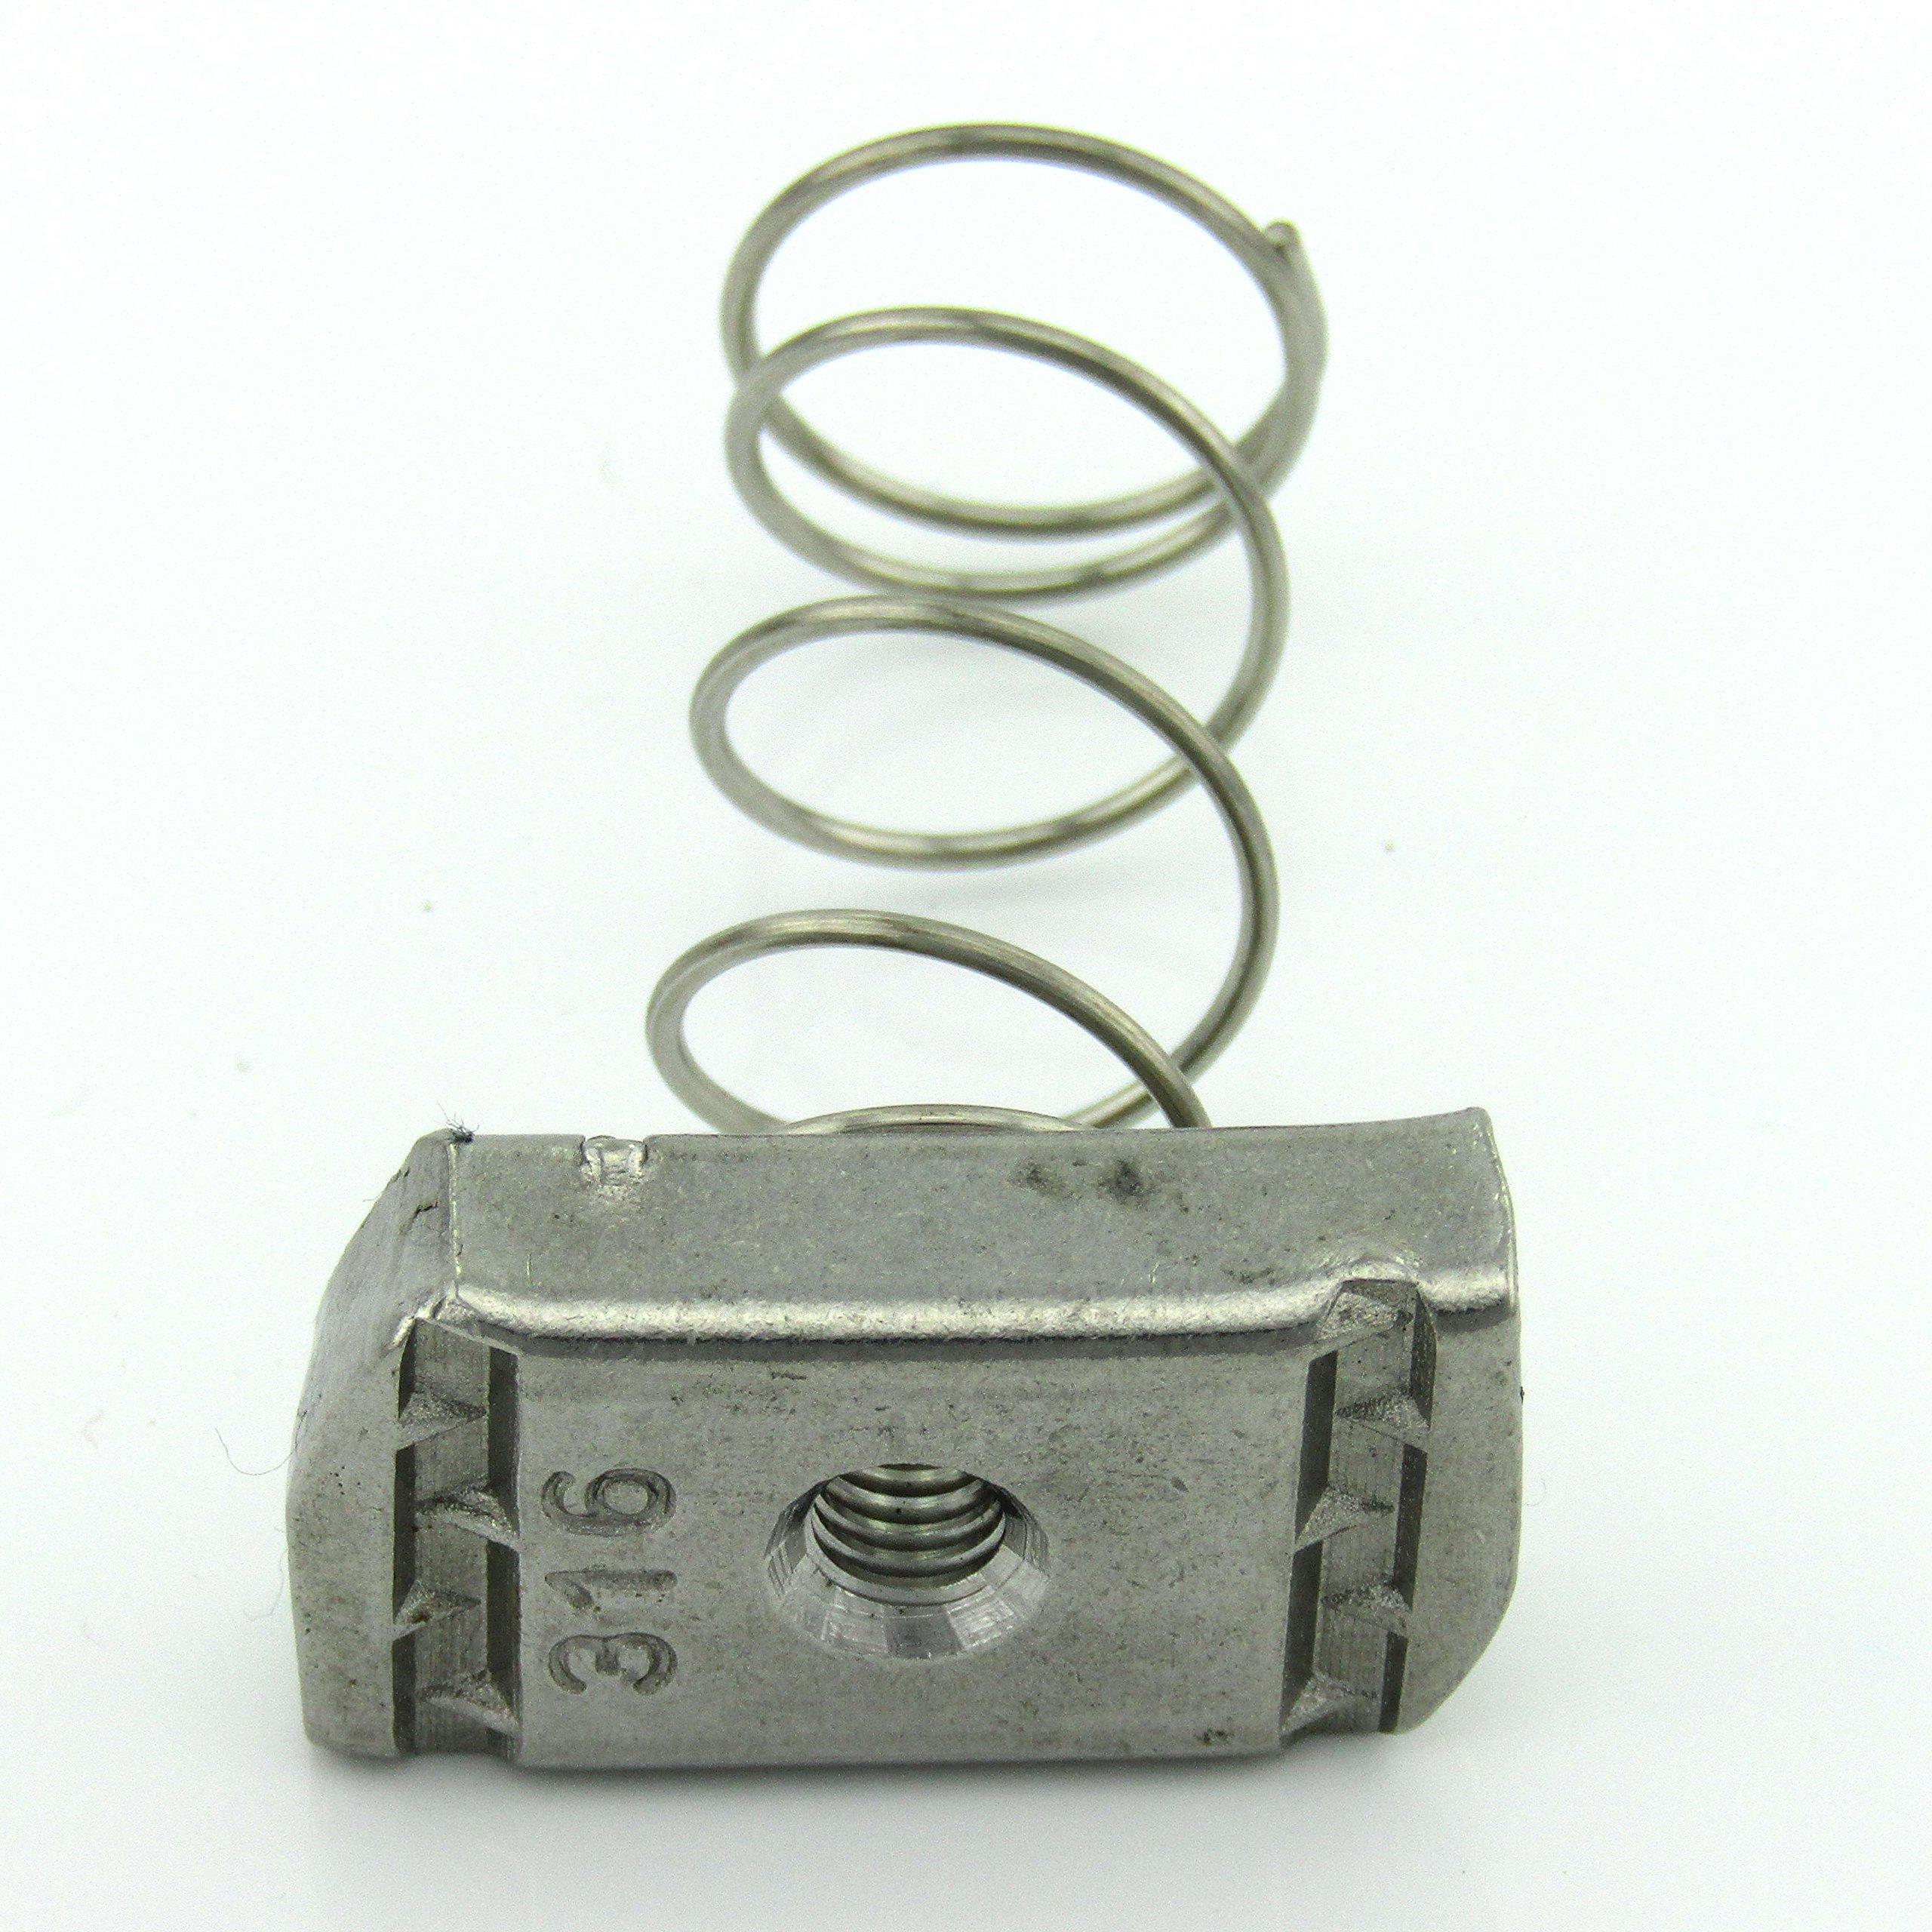 6mm Spring Nut 316 S/S (100 per box)